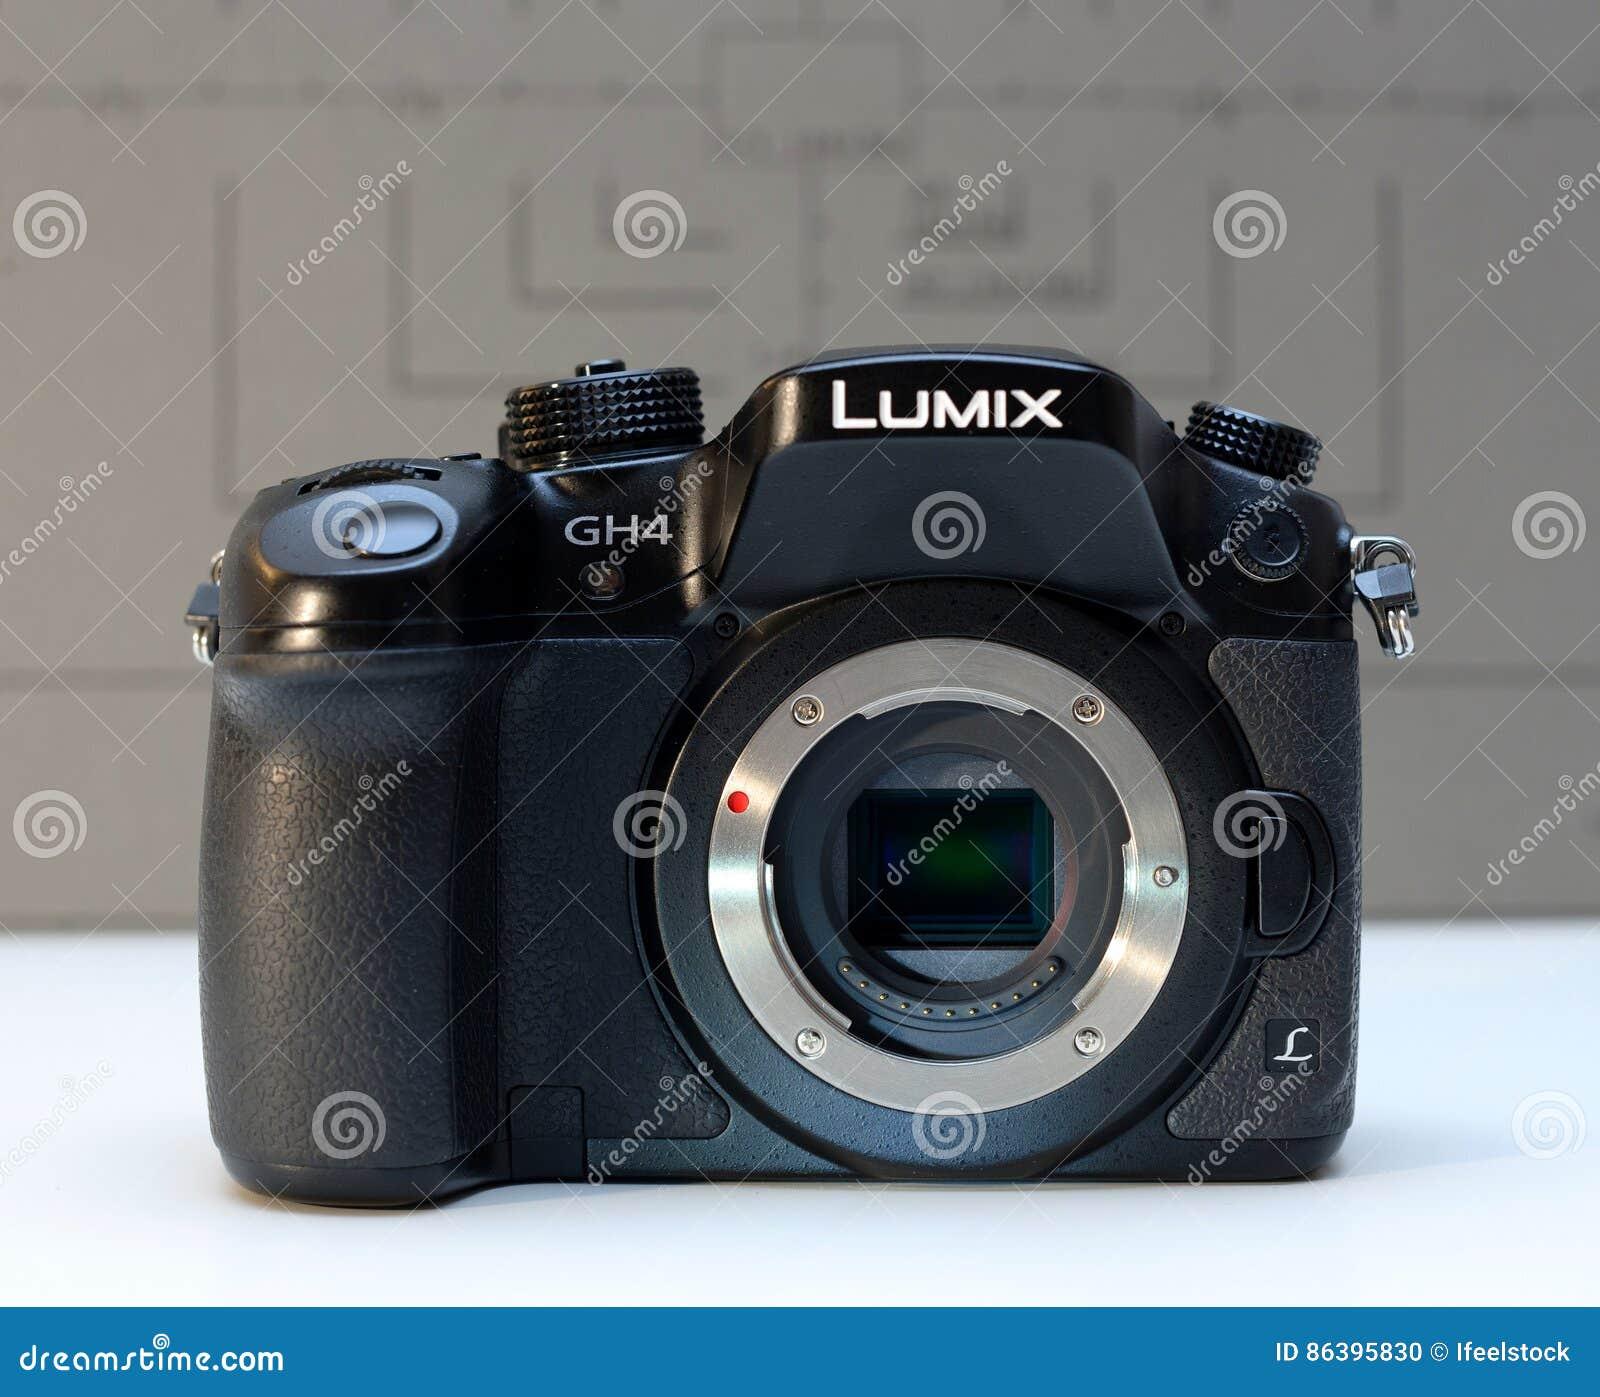 Panasonic Lumix DMC-GH4 Mirrorless Camera Editorial Image